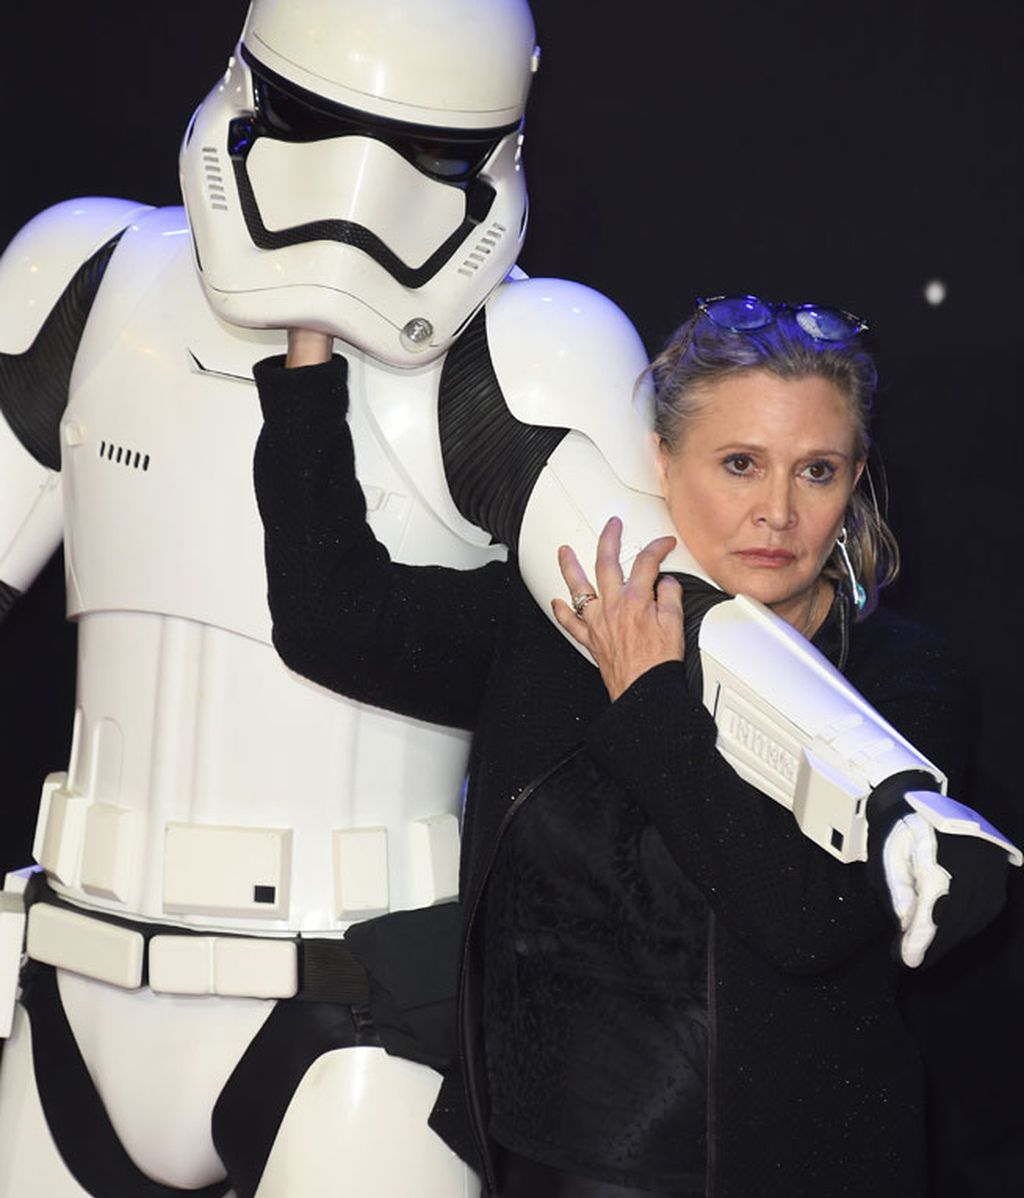 Fallece Carrie Fisher, la actriz que encarnó a la Princesa Leia